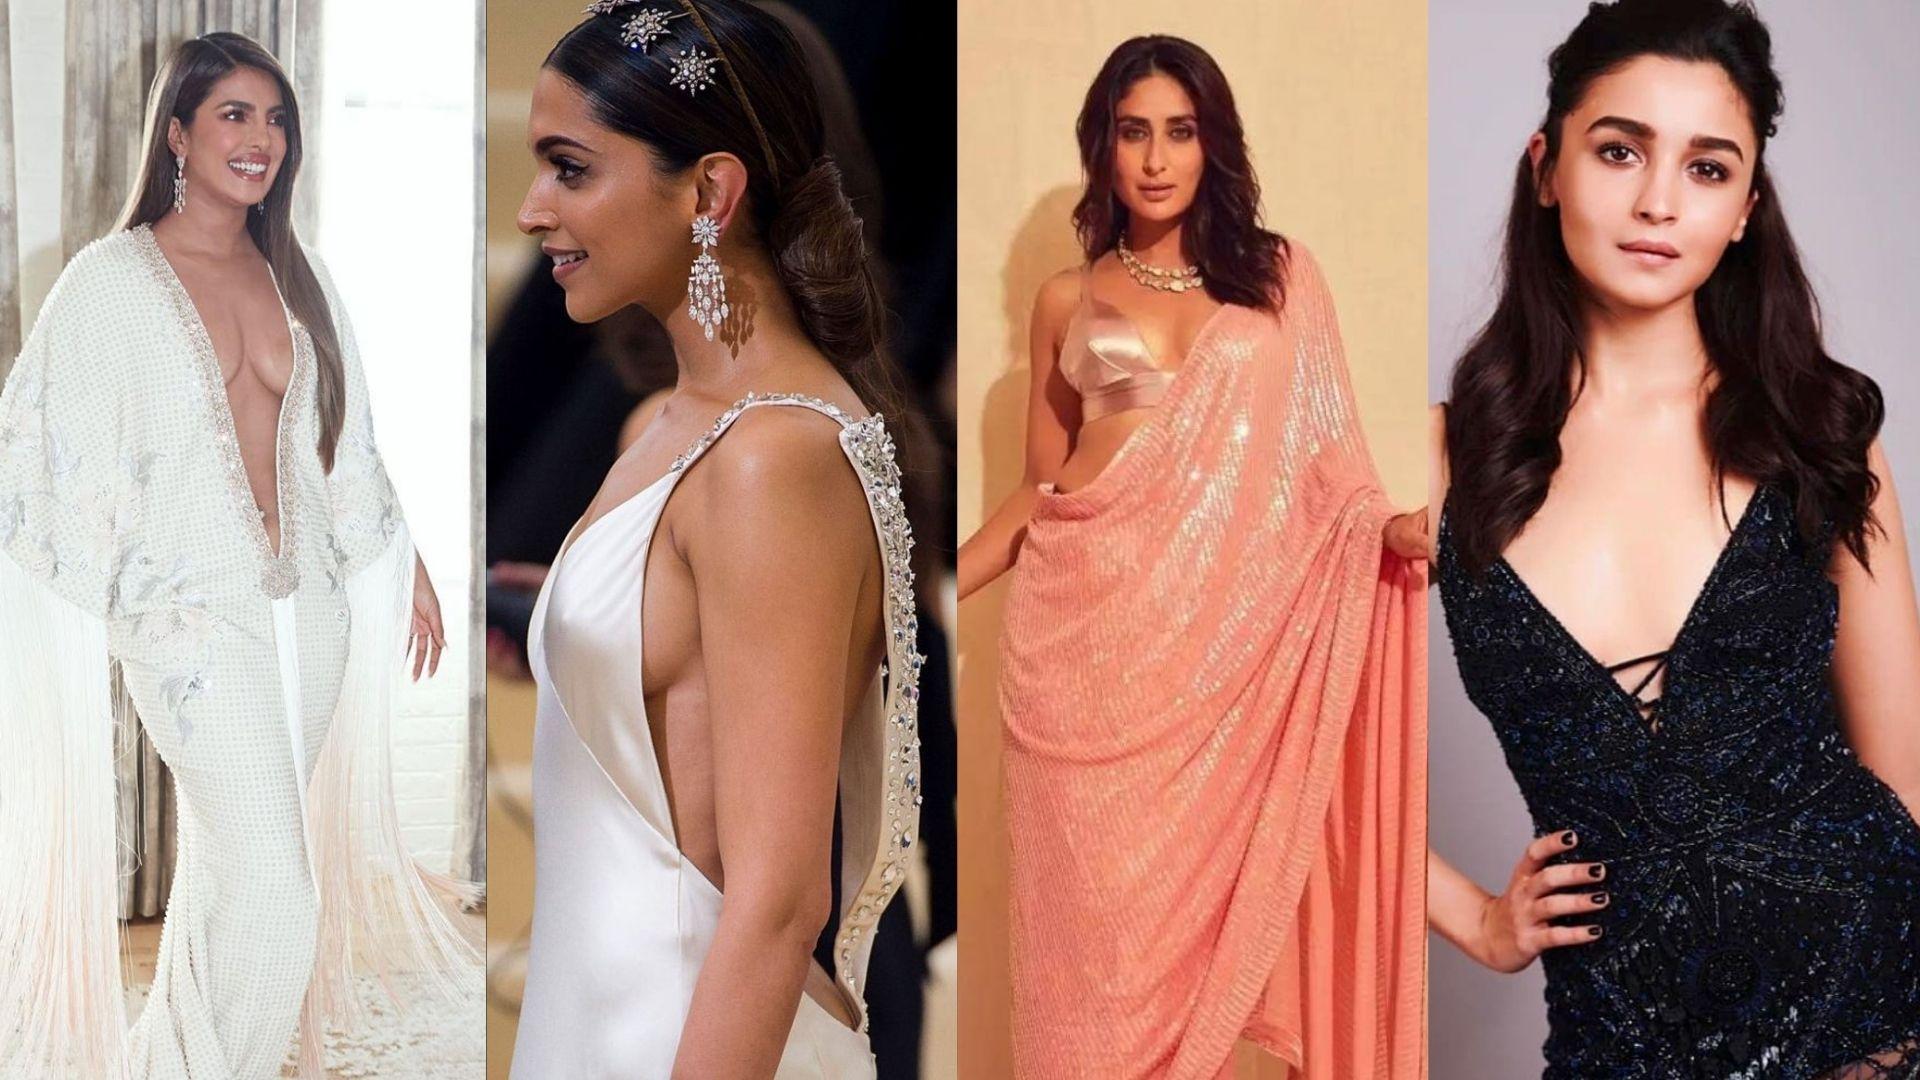 Priyanka Chopra, Kareena Kapoor, Alia Bhatt, Deepika Padukone And Other Bollywood Divas Who Had Their Oops Fashion Moment